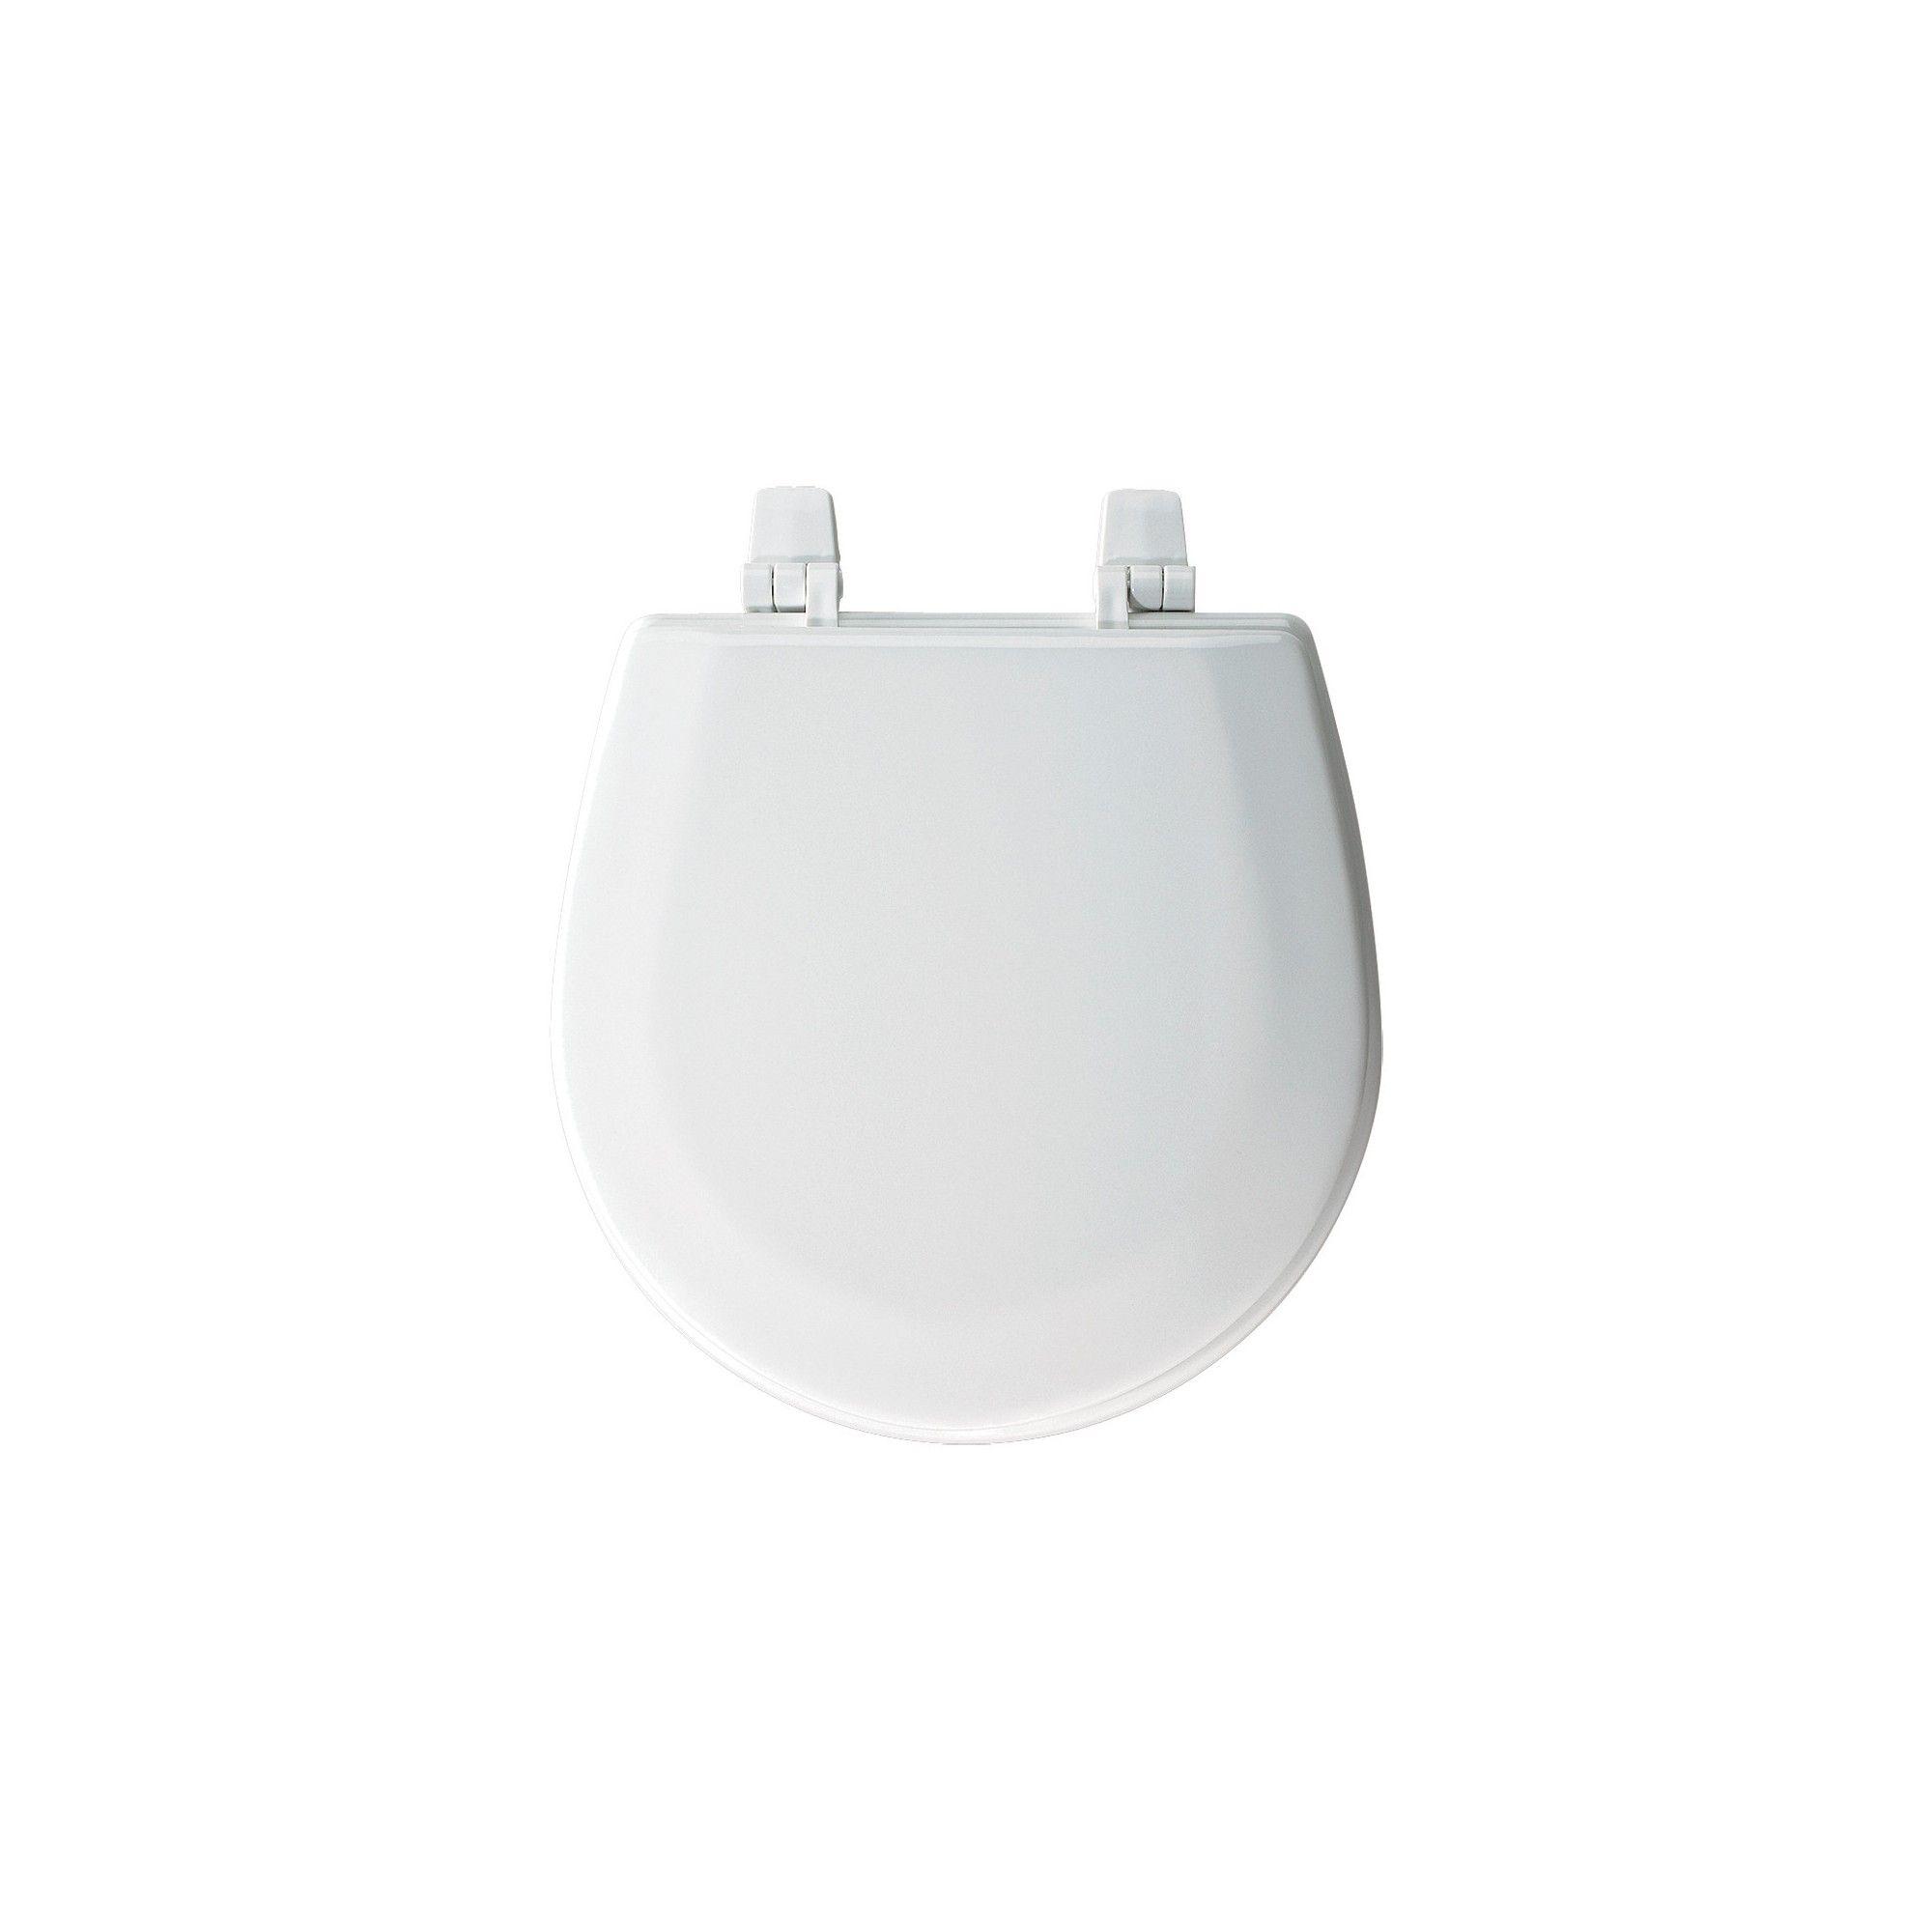 Bemis Tc50tta Marine Bowl Molded Wood Toilet Seat White No